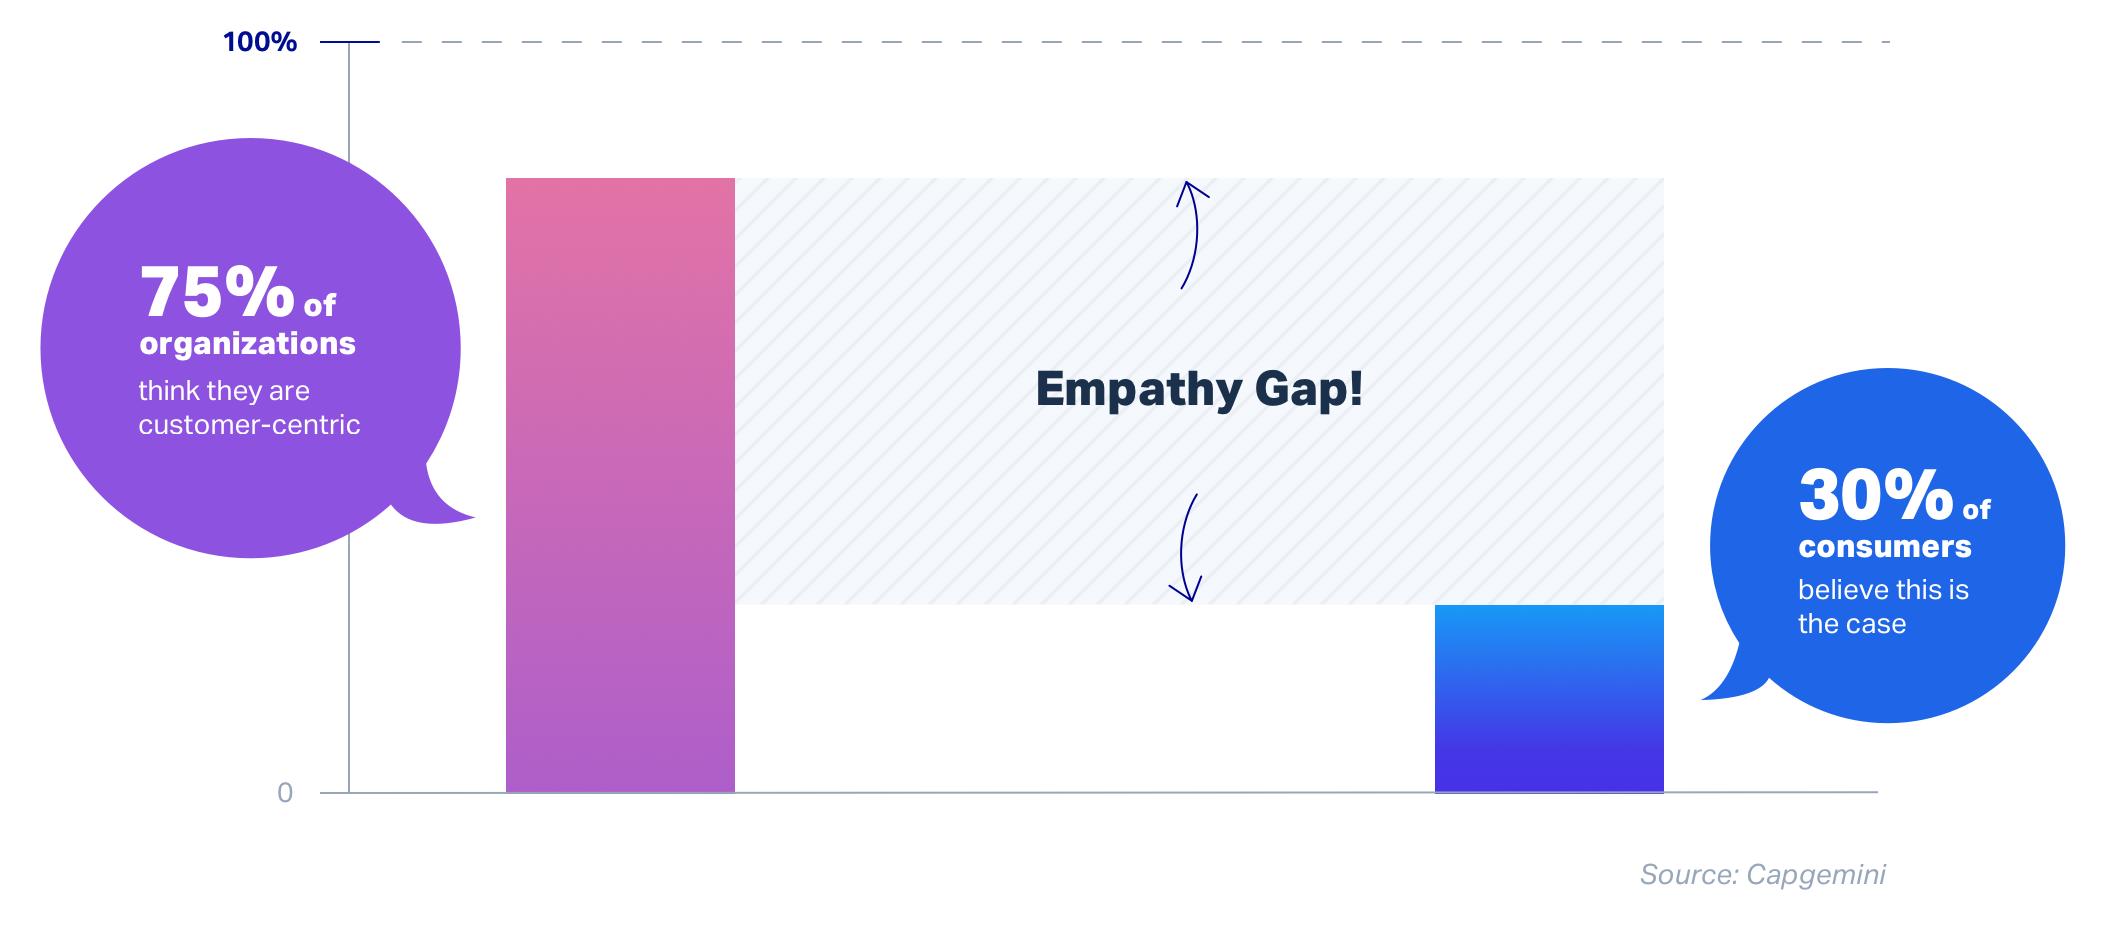 Empathy Gap iLoyal CX Customer Experience